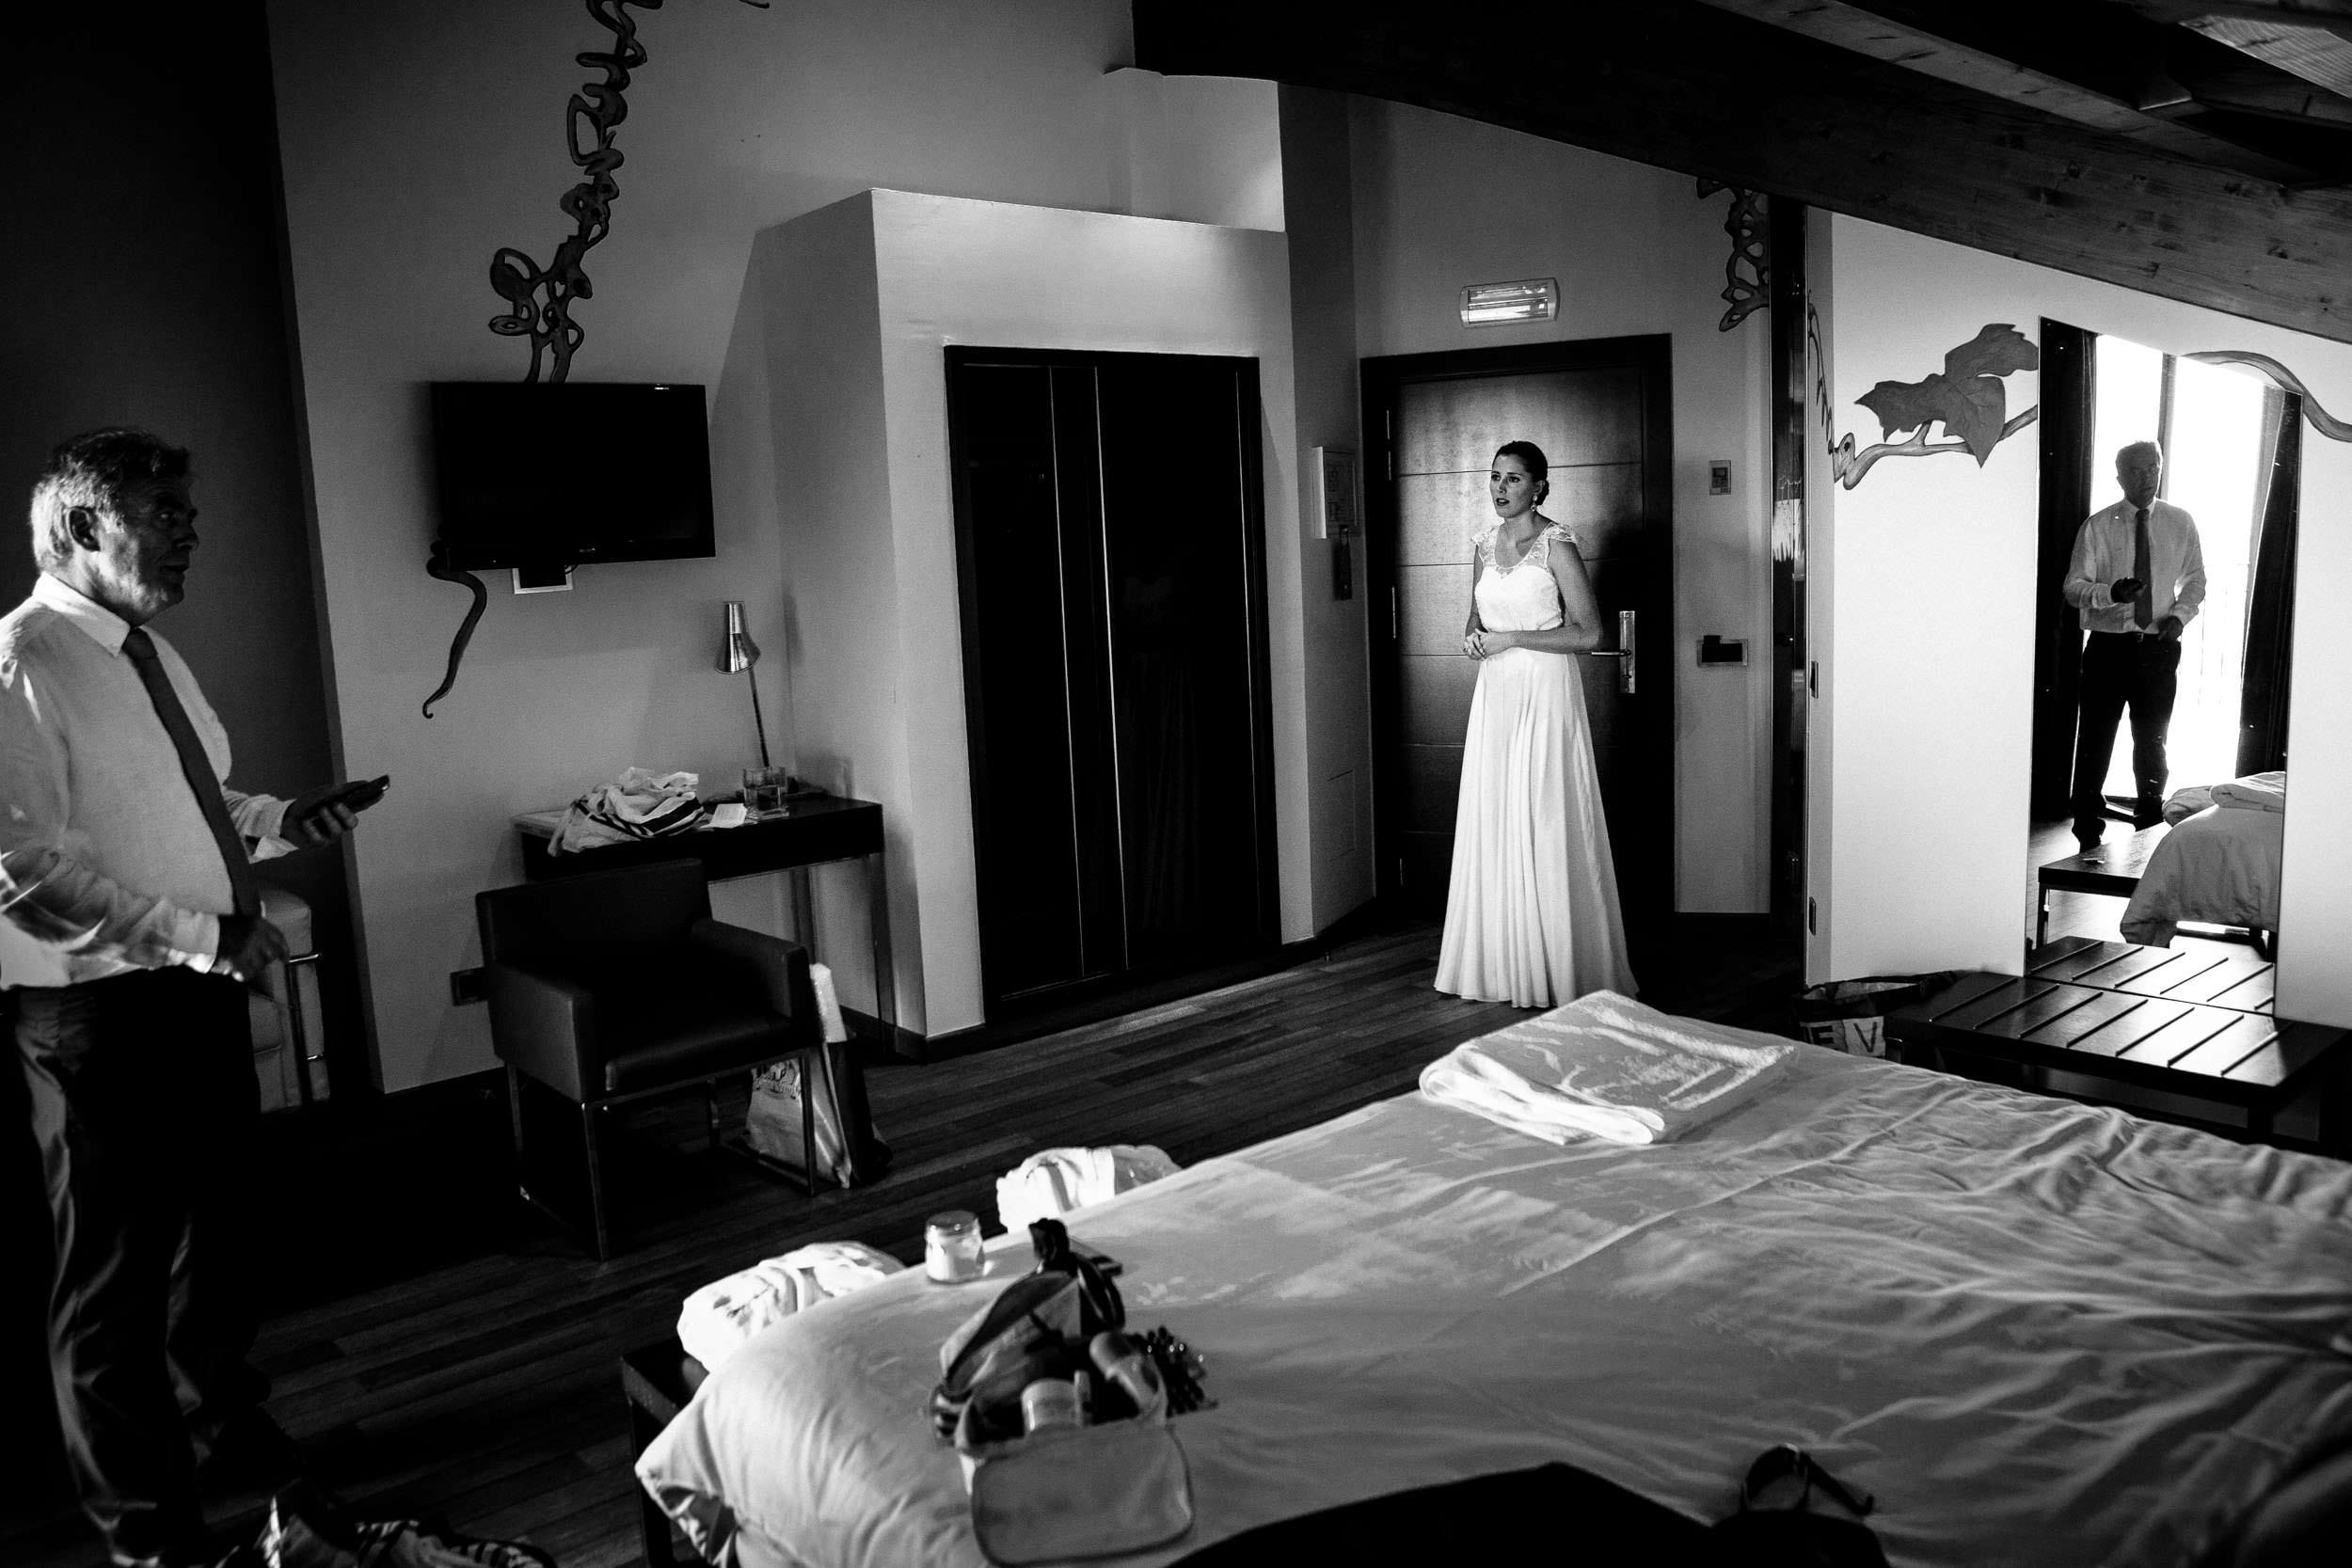 Fotografia de Boda - Hotel Eguren Ugarte Laguardia Alava Pais Vasco - James Sturcke  Photographer | sturcke.org_003.jpg